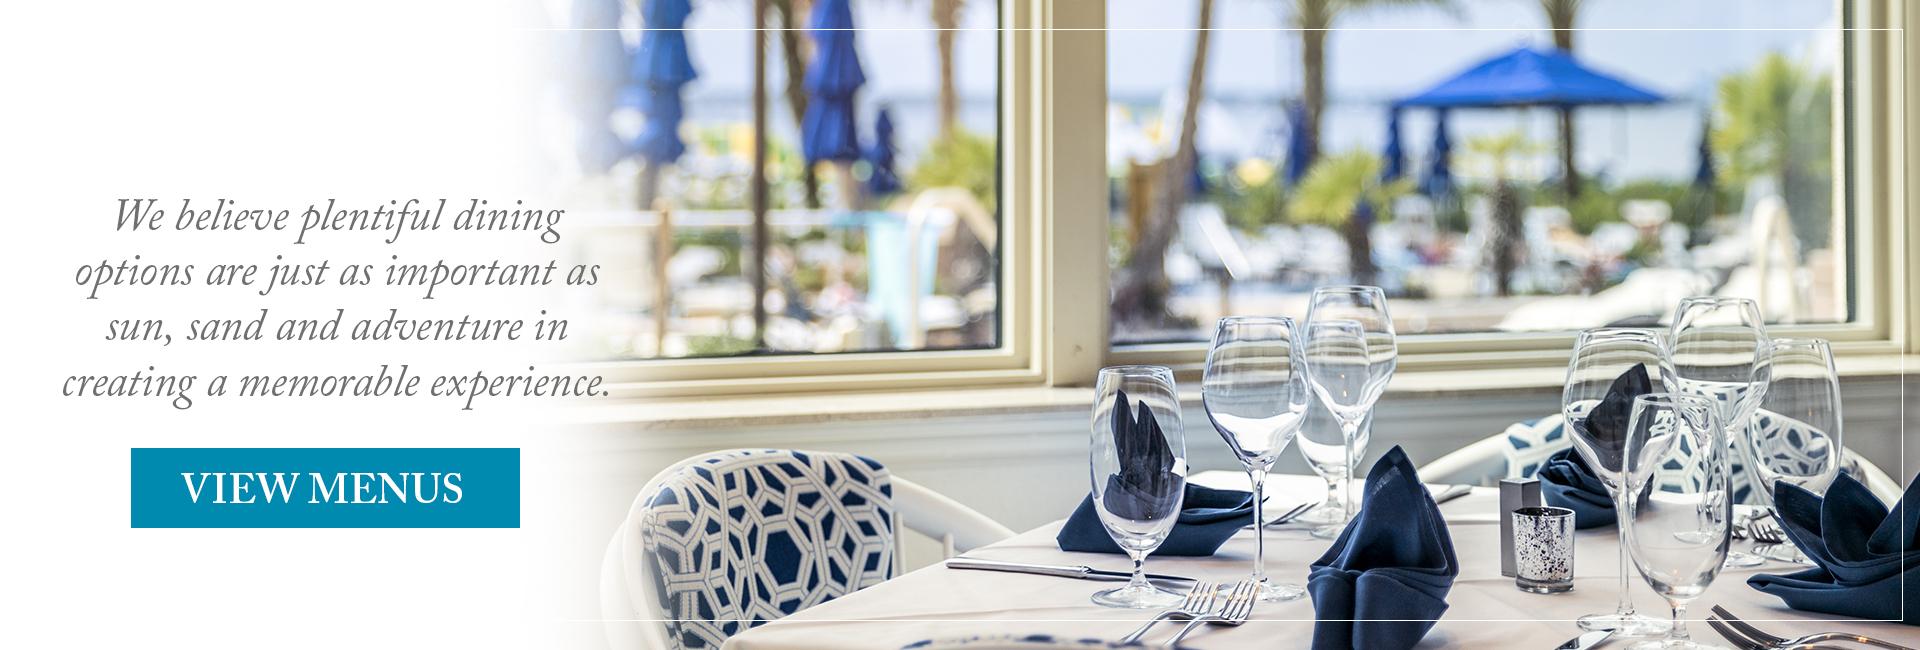 Dining options at Portofino Island Resort